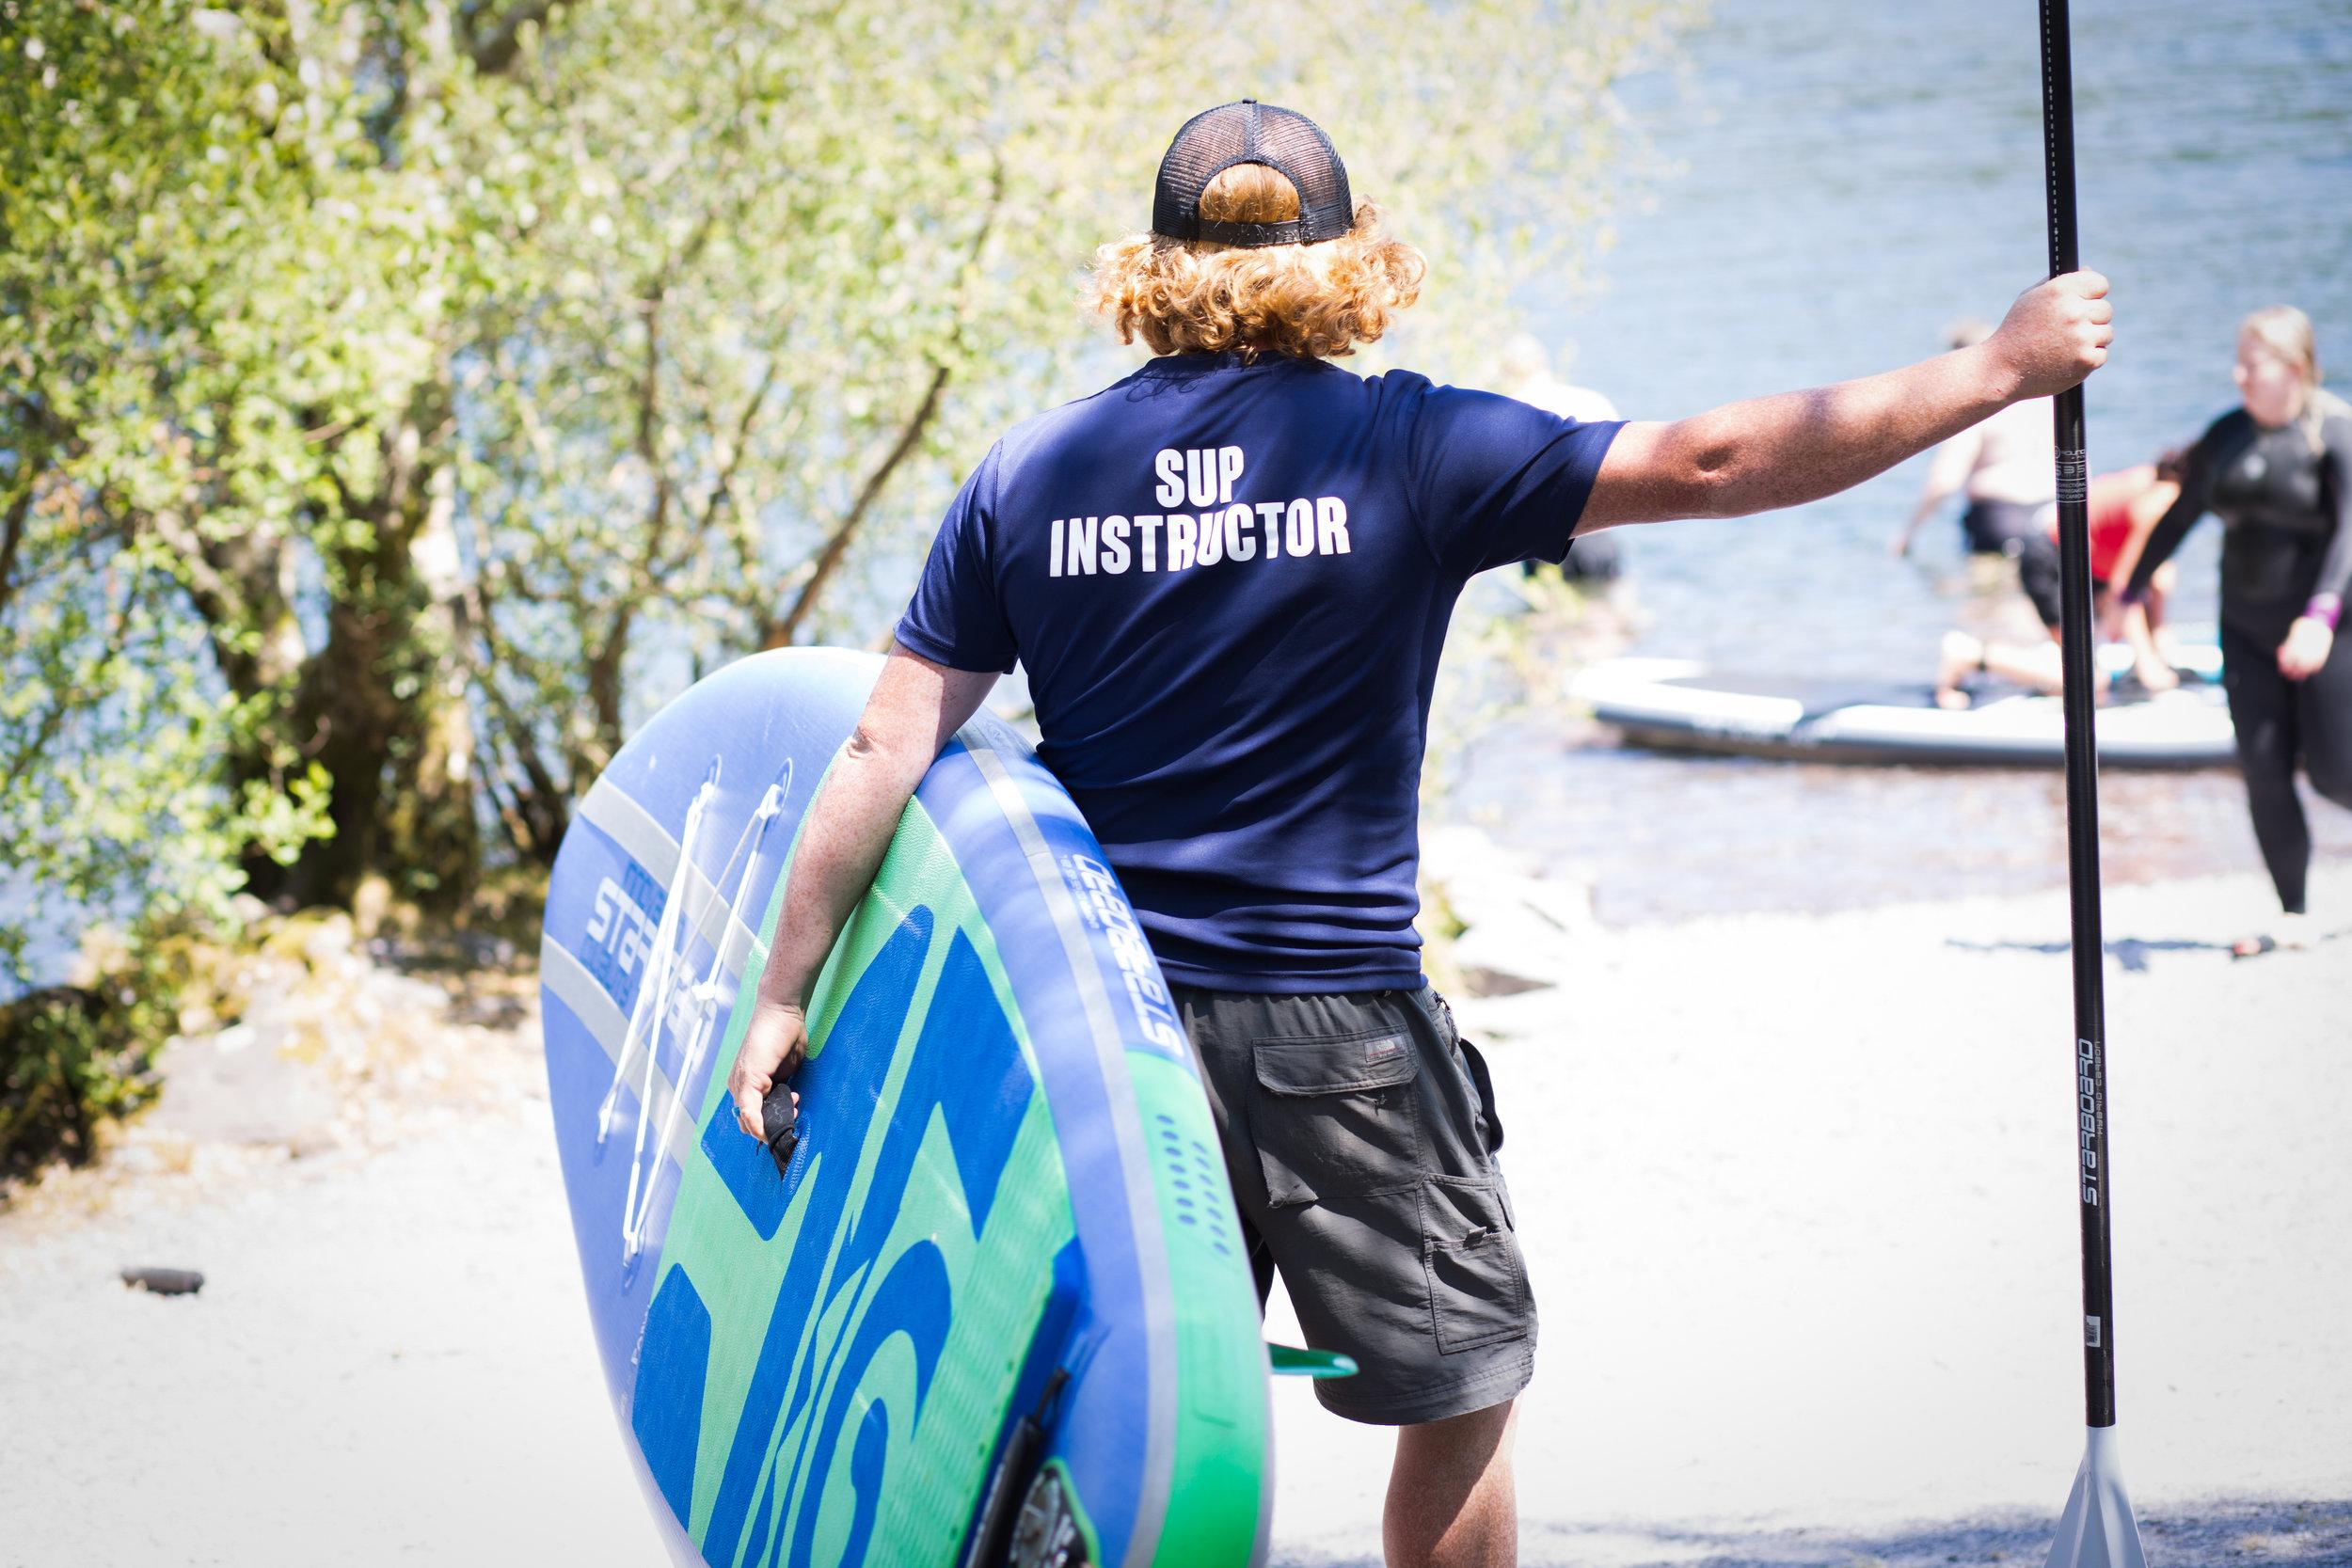 02_07_18_Psyched_Paddleboarding_0989_original.jpg